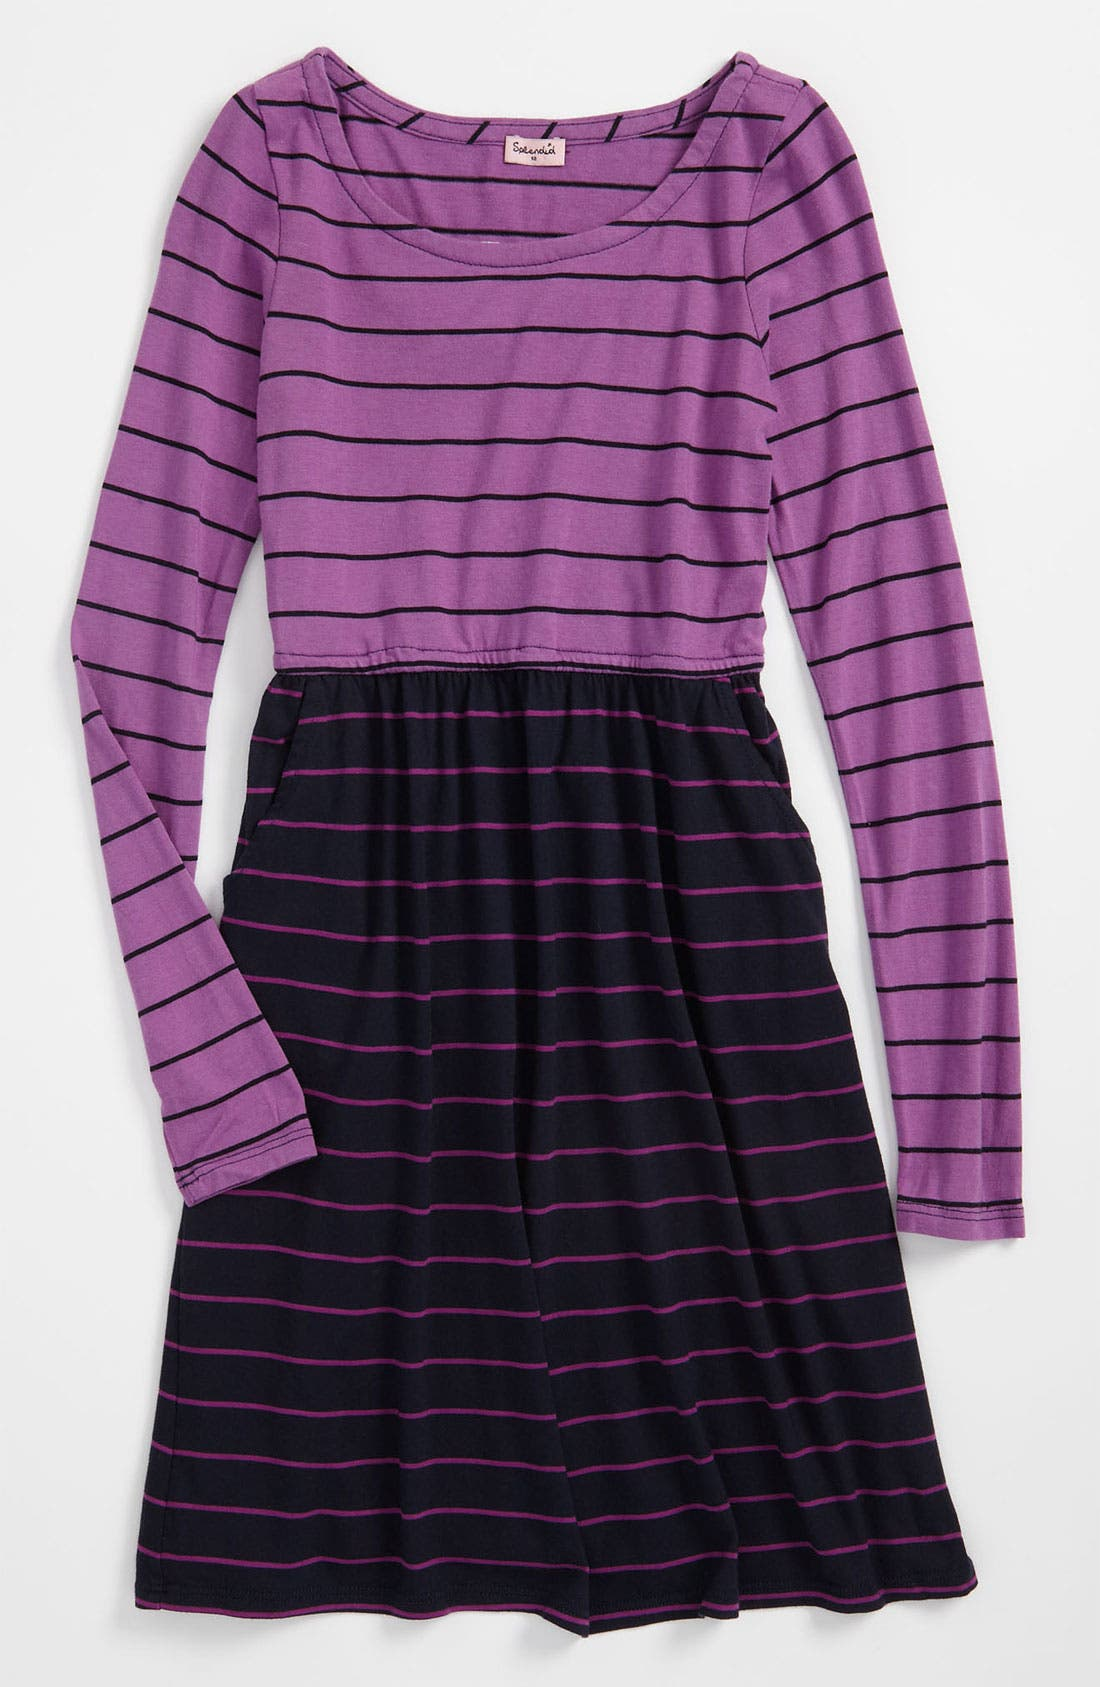 Main Image - Splendid 'Lacrosse Stripe' Dress (Big Girls)